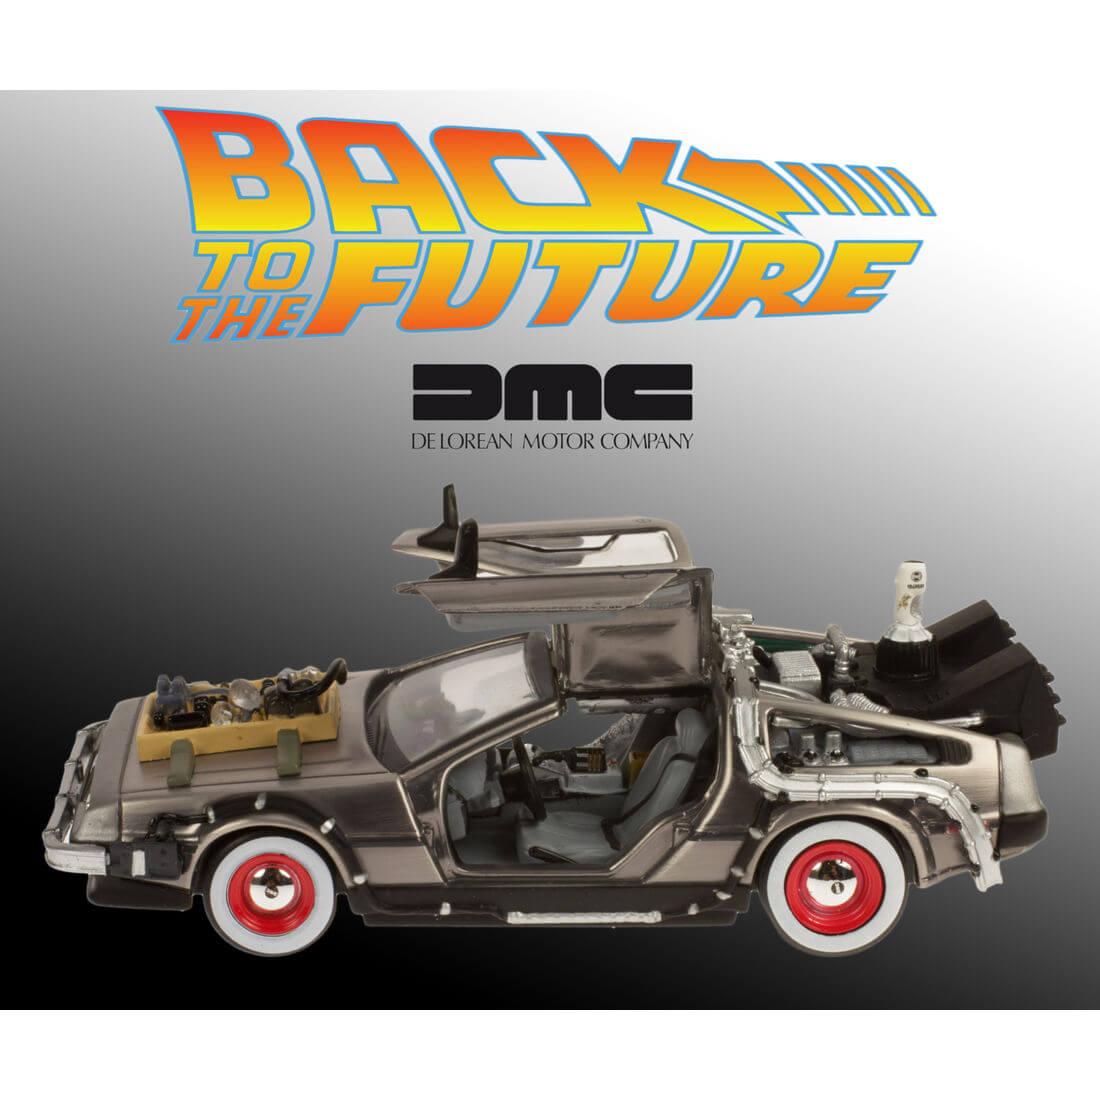 Das Modell des DeLorean (Bildrechte: getdigital.de)